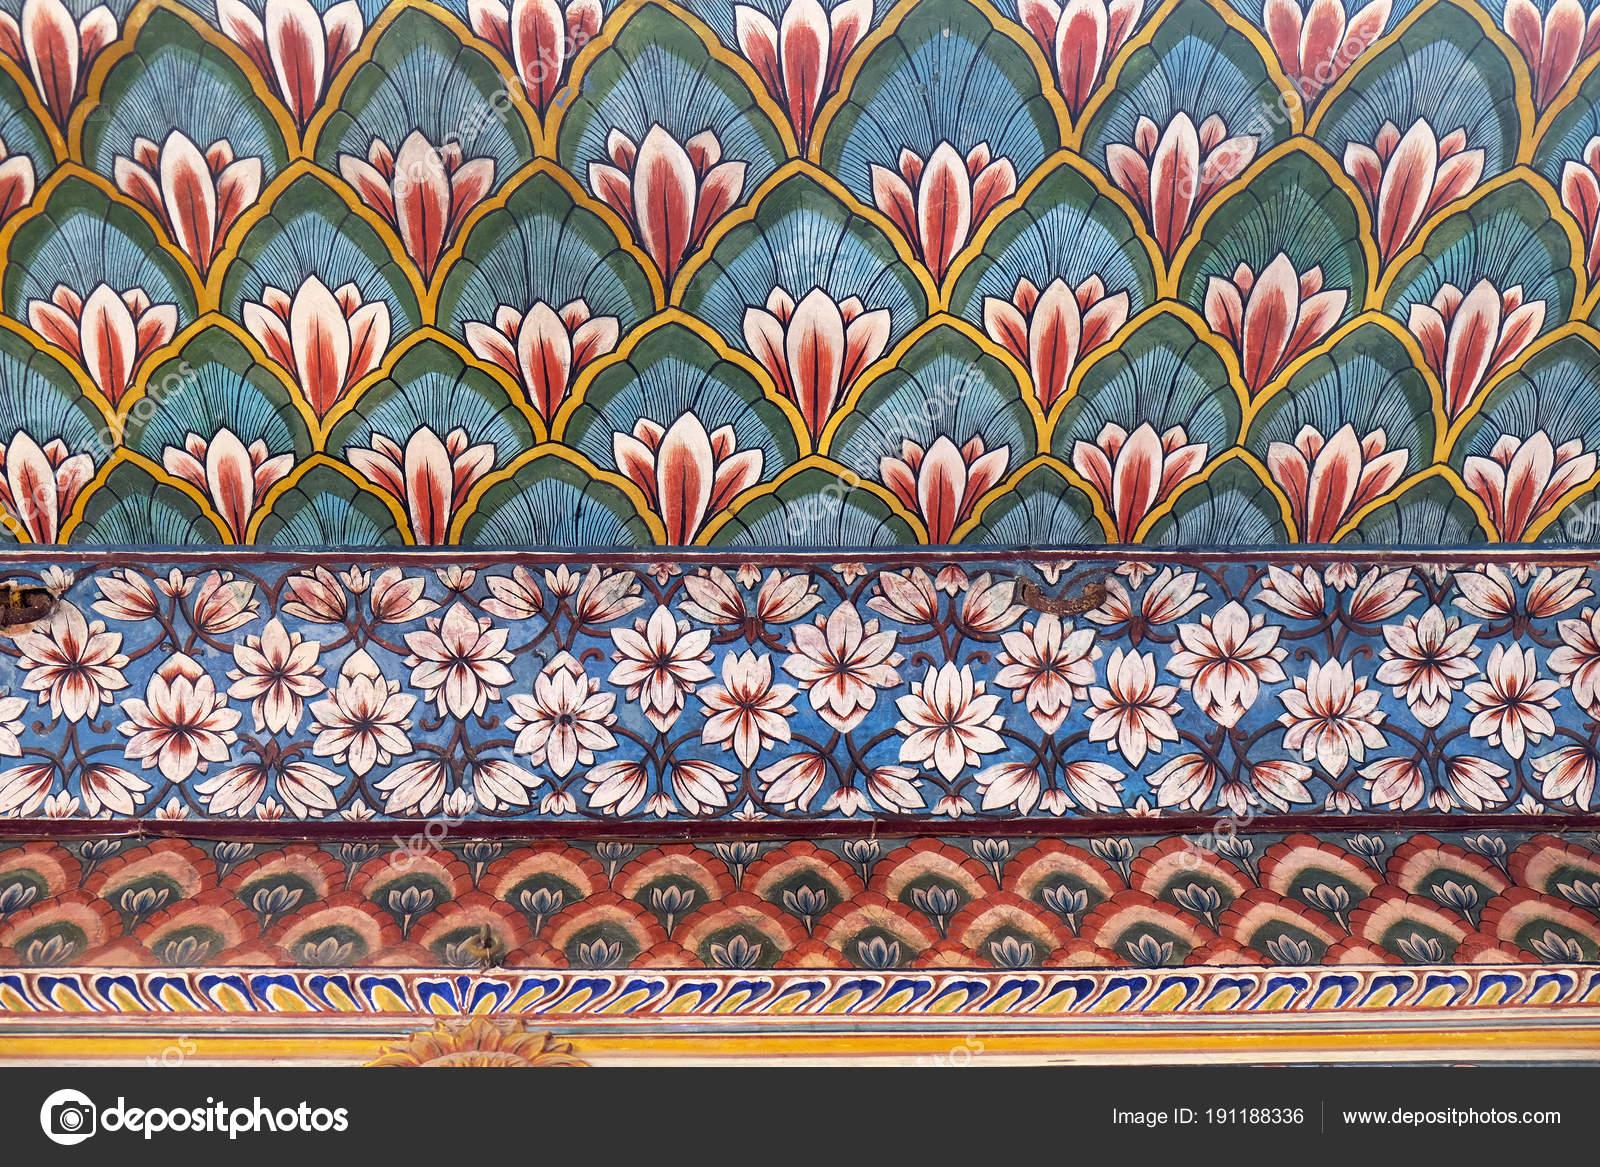 Wall Paintings Chandra Mahal Jaipur City Palace Jaipur Rajasthan